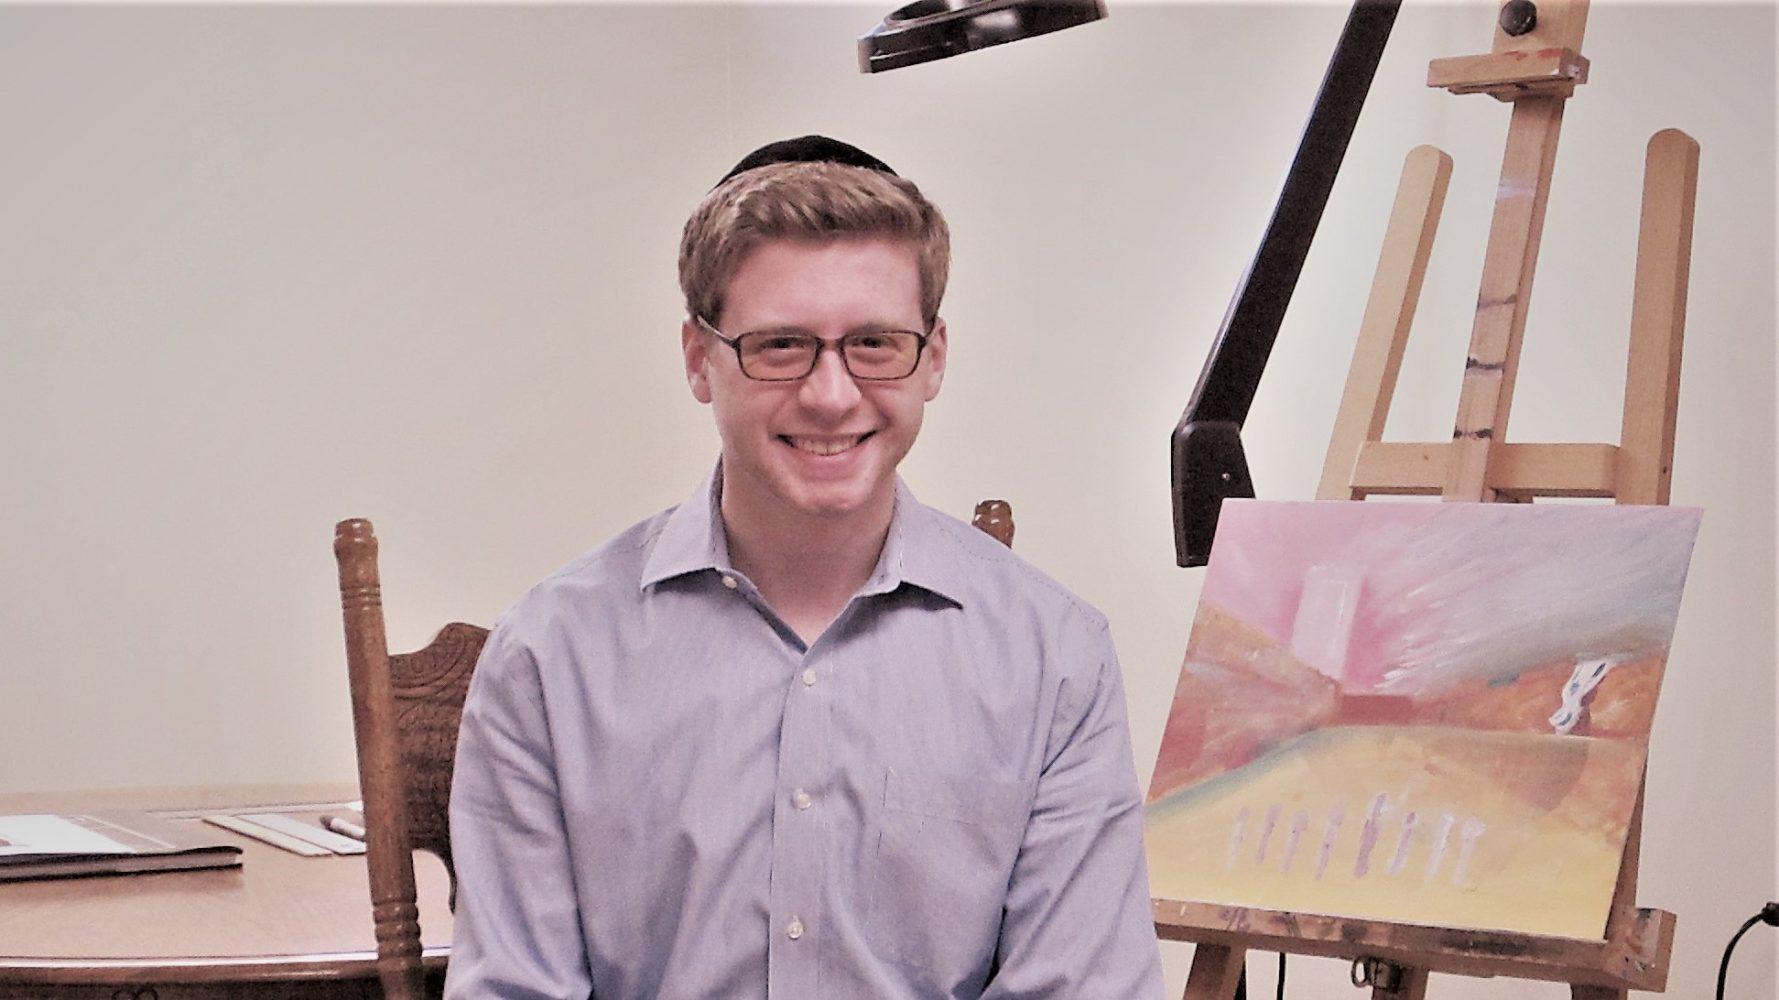 Meet Marketing Supply Co.'s newest team member, Josh El'Chonen.